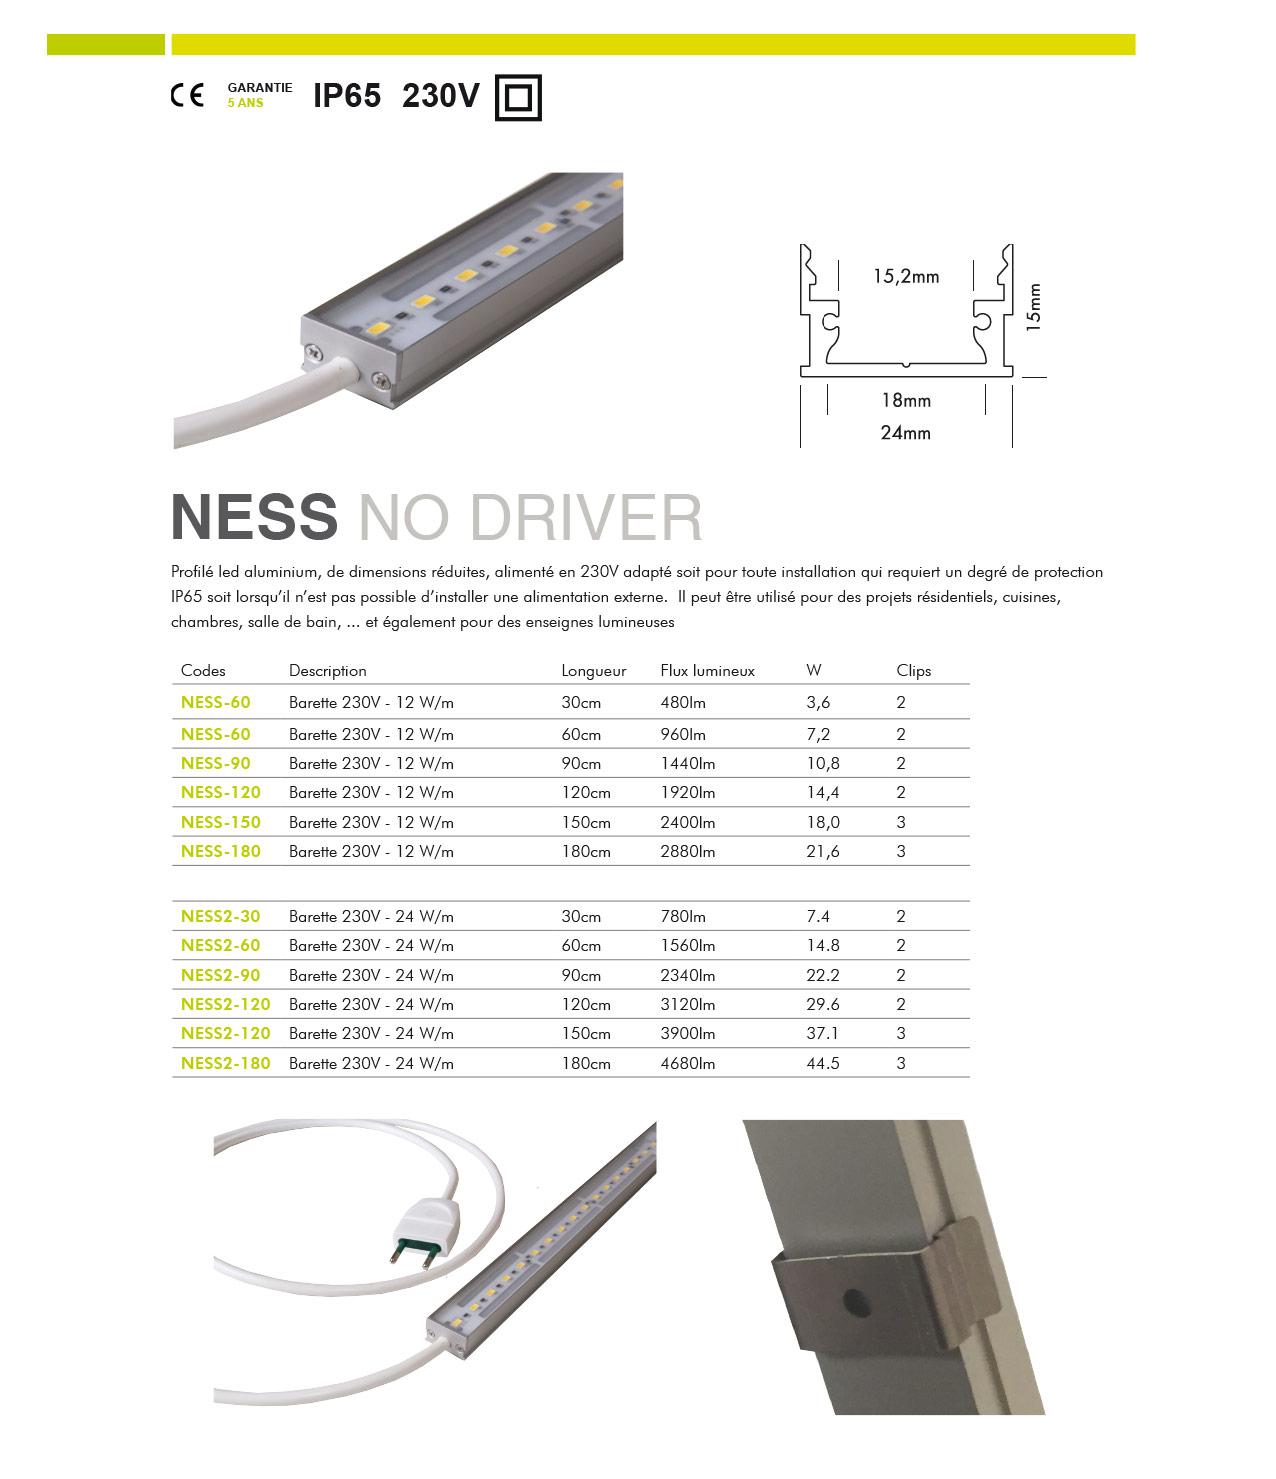 ness-drivers